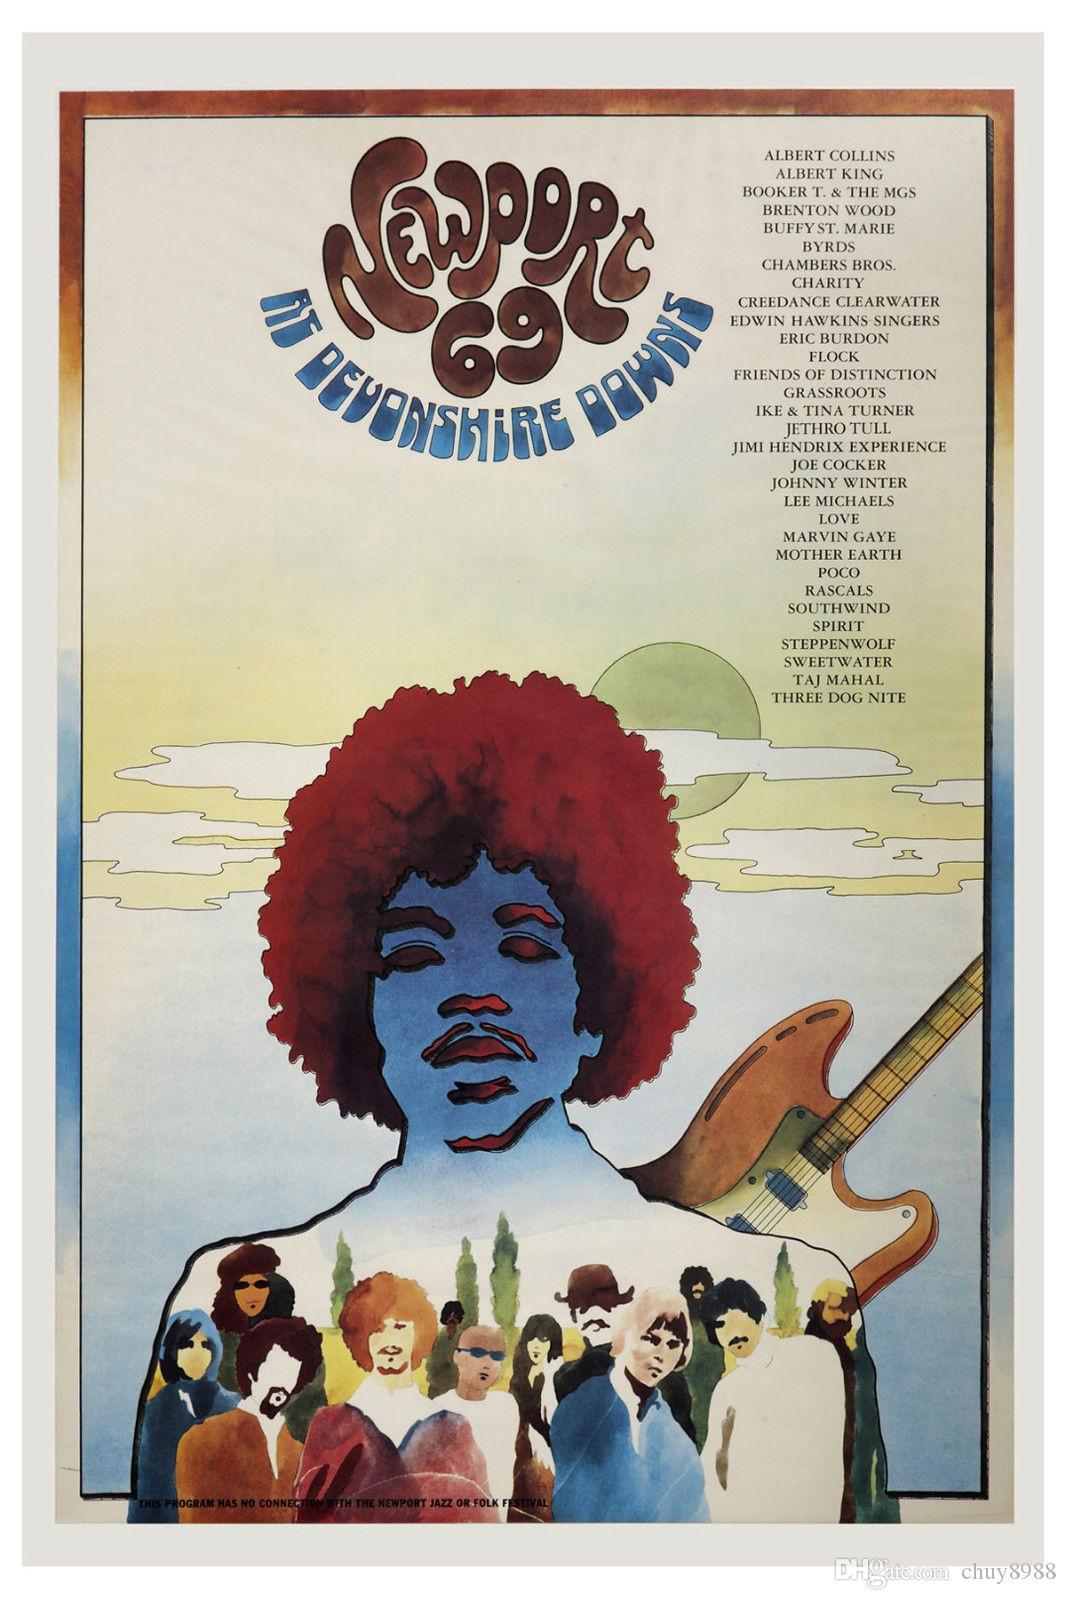 1960's Rock: Jimi Hendrix at Newport 69 at Devonshire Downs Concert Art Silk Print Poster 24x36inch(60x90cm) 018